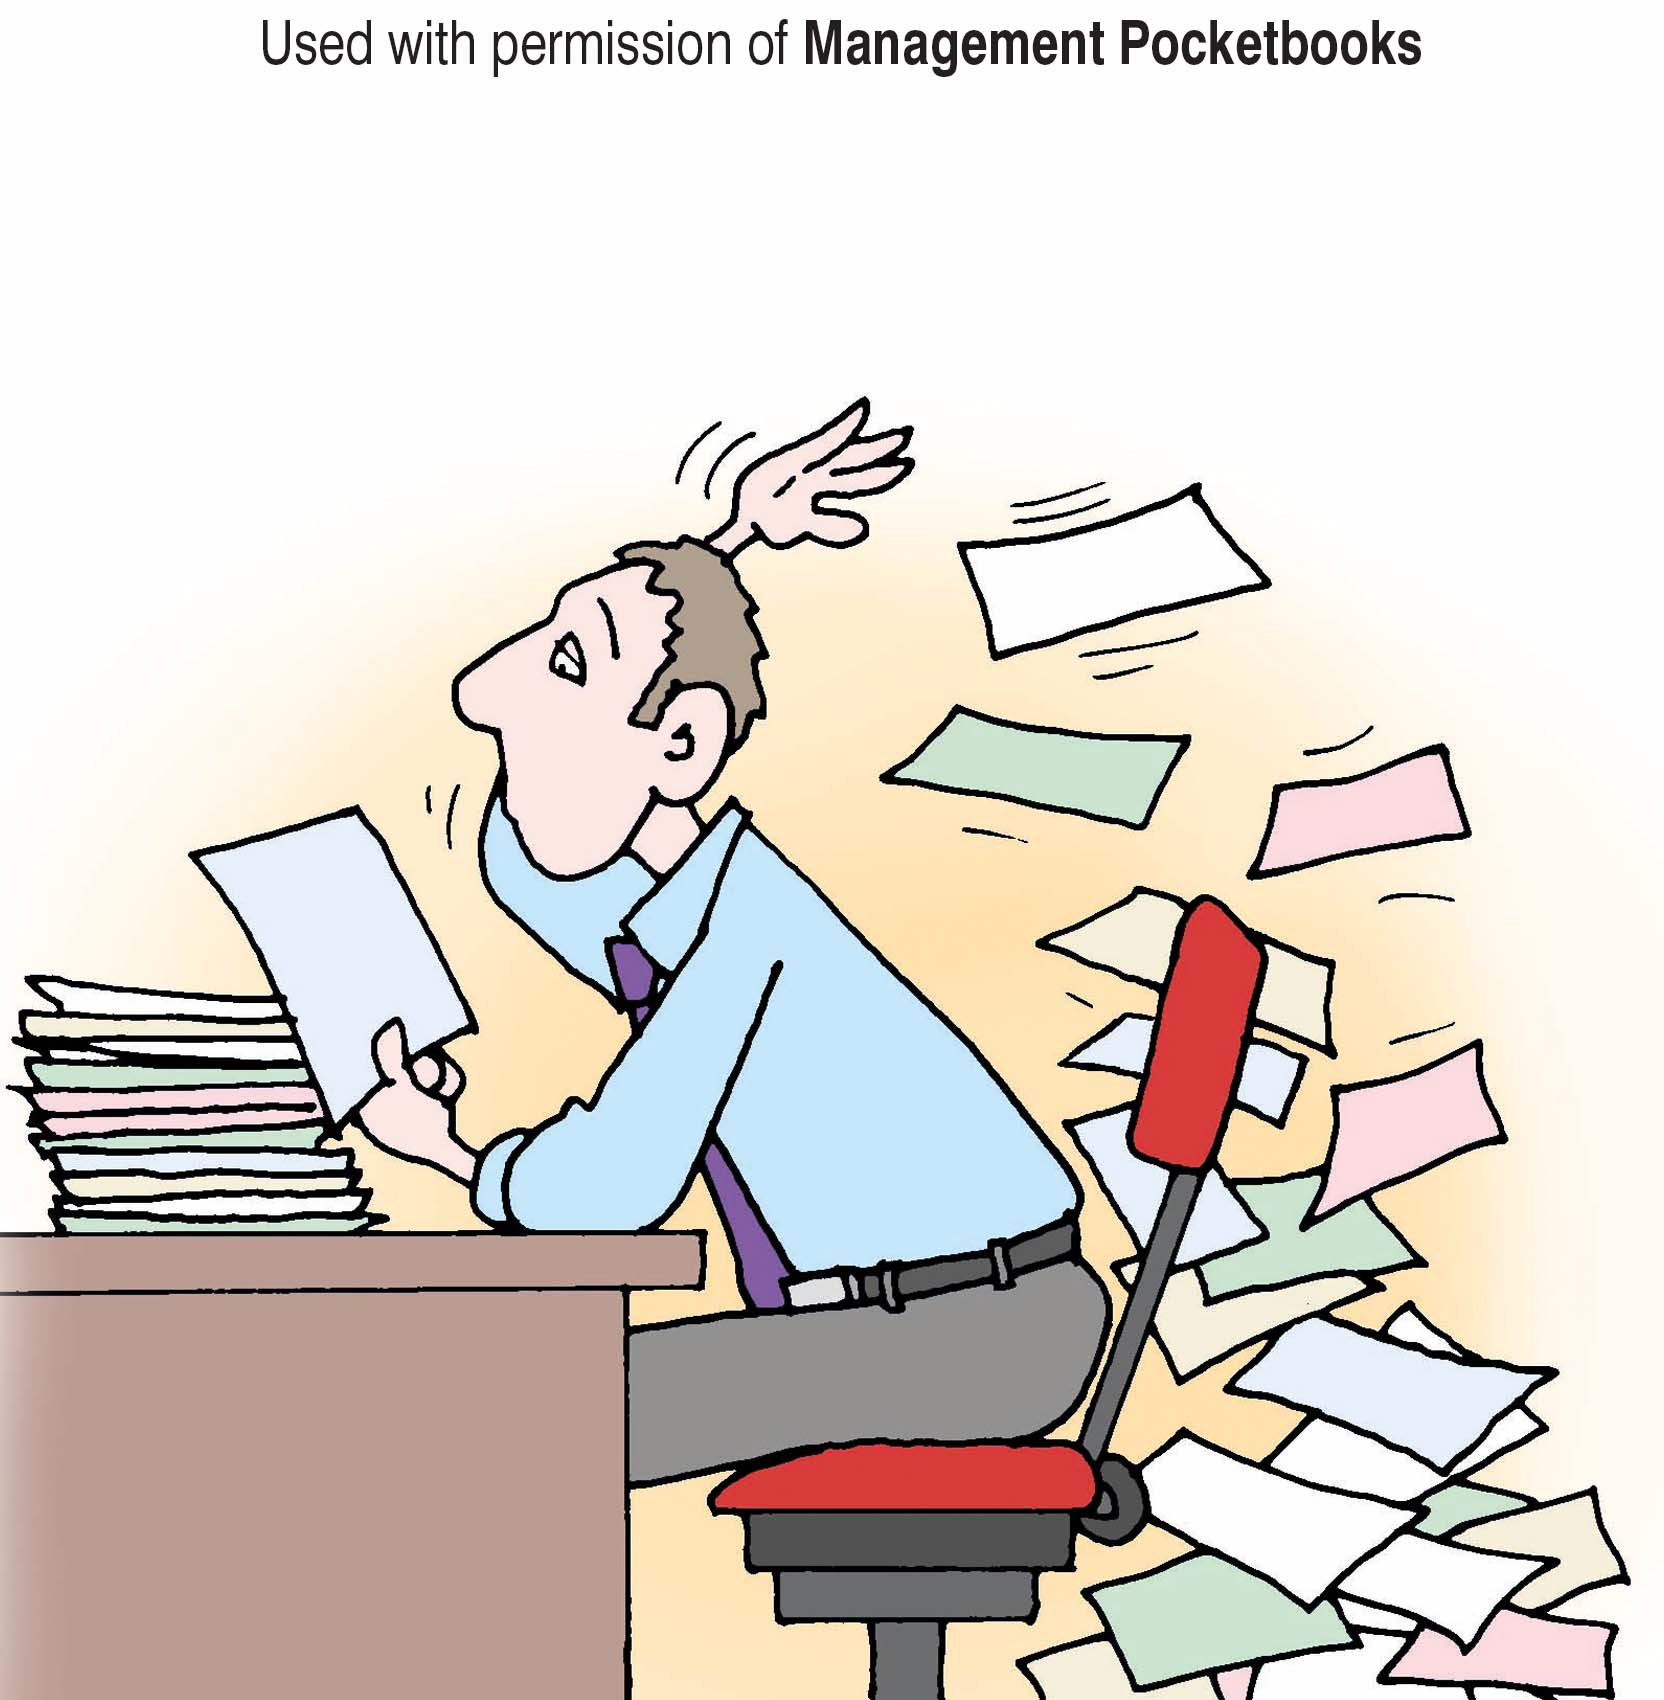 Free cartoons - Management Pocketbooks